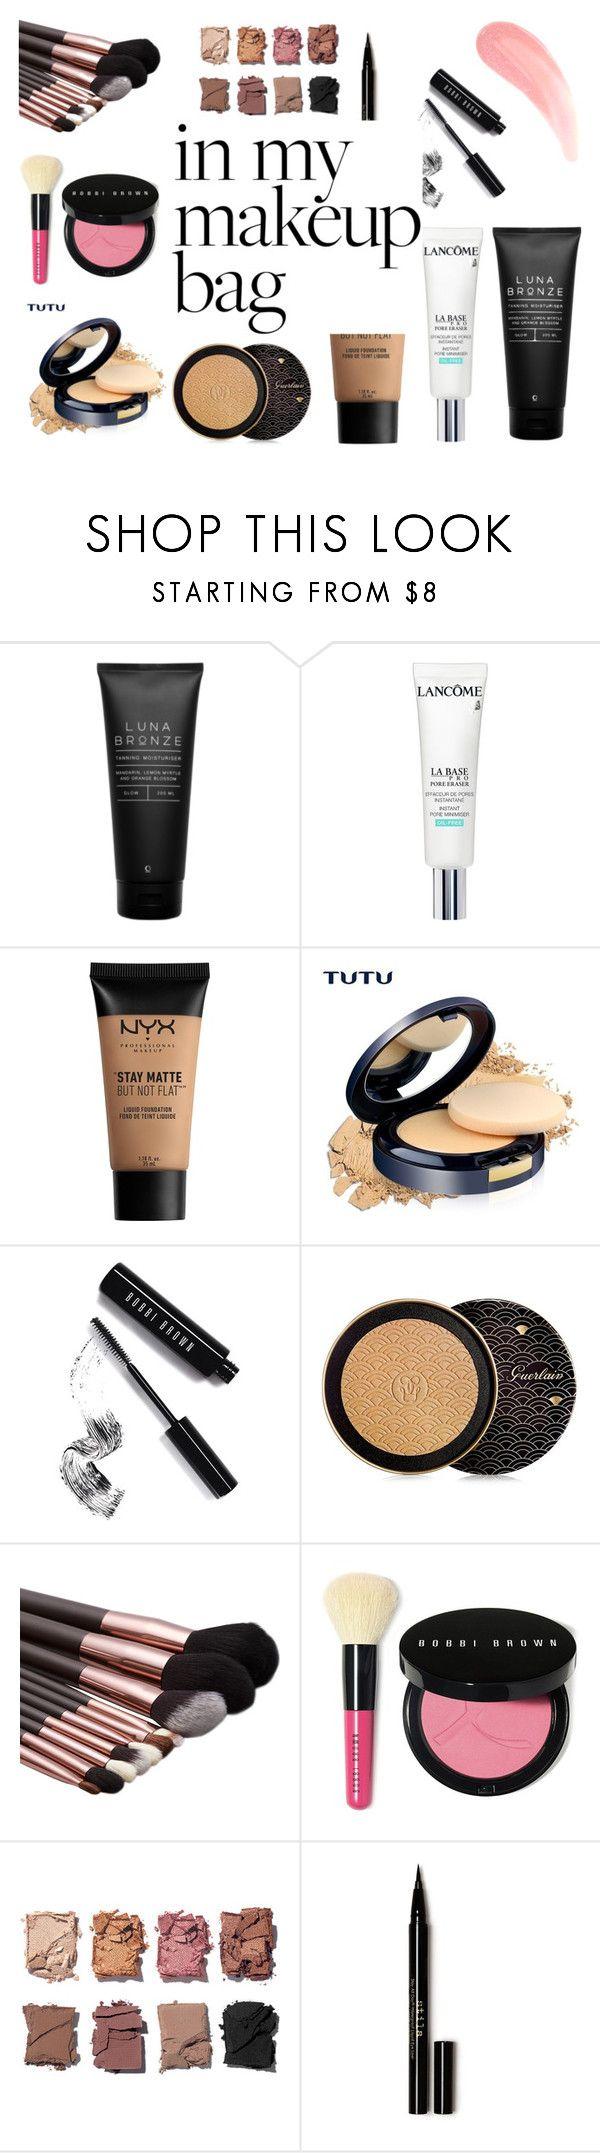 """make up bag"" by bec64 ❤ liked on Polyvore featuring beauty, Luna Bronze, Lancôme, NYX, Bobbi Brown Cosmetics, Guerlain, Illamasqua and Stila"